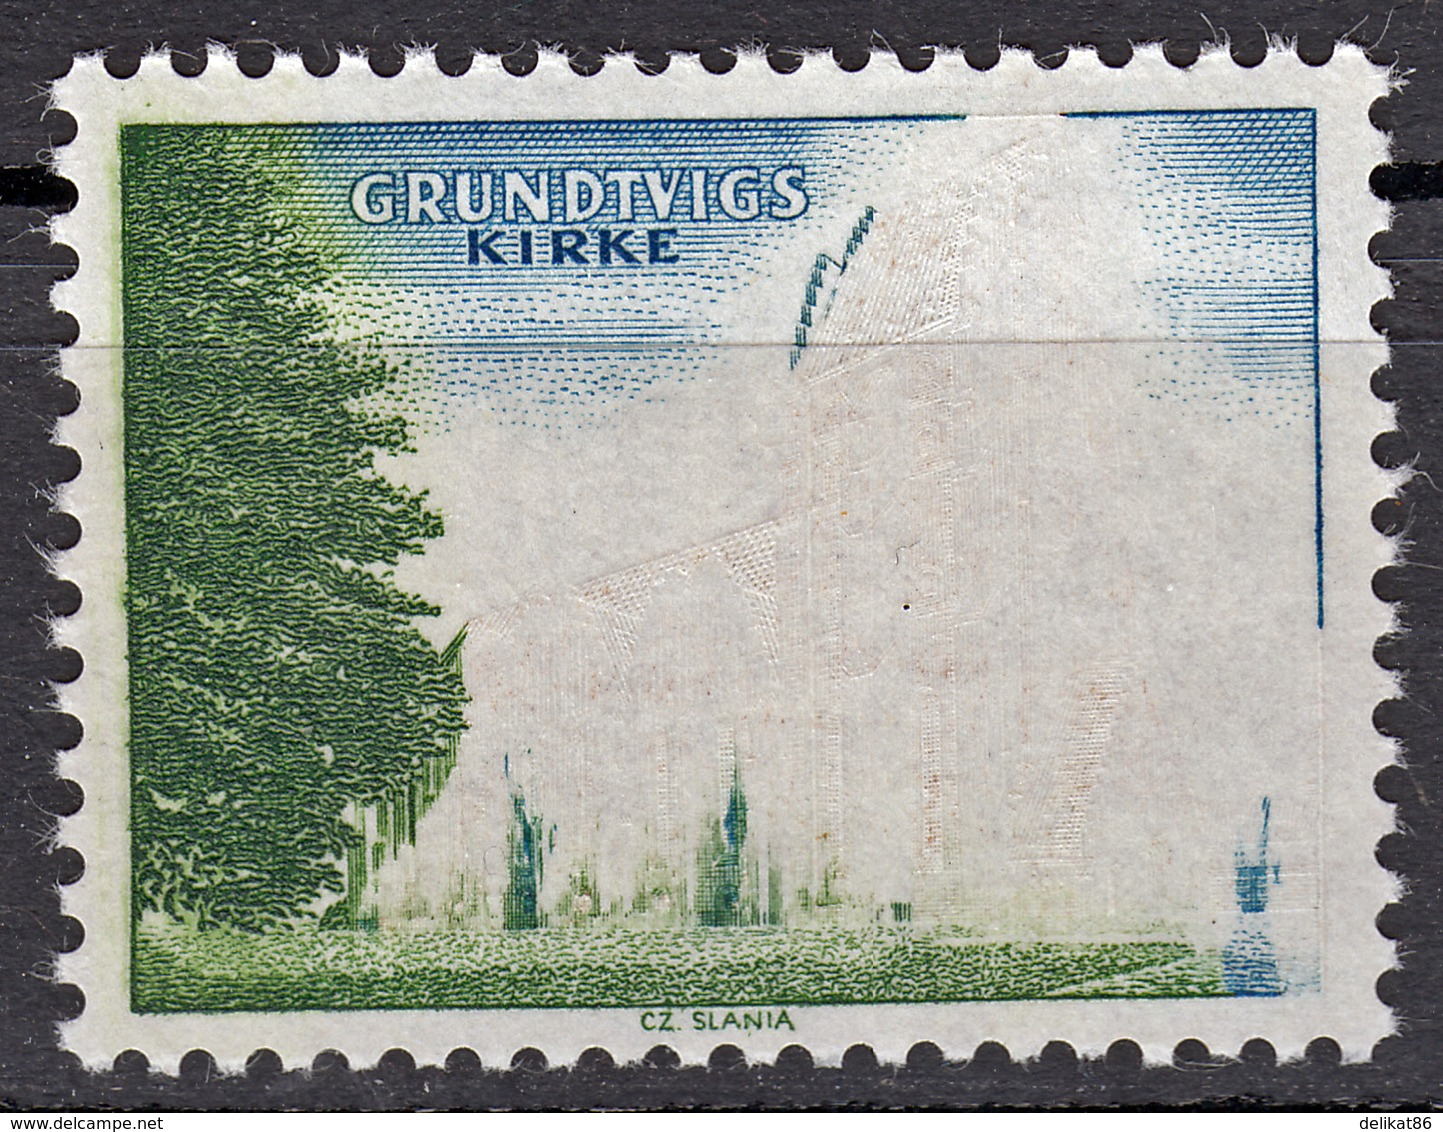 Probedruck, Test Stamp, Specimen, Prove, Grundtvig Kirke, Slania 1968 - Probe- Und Nachdrucke